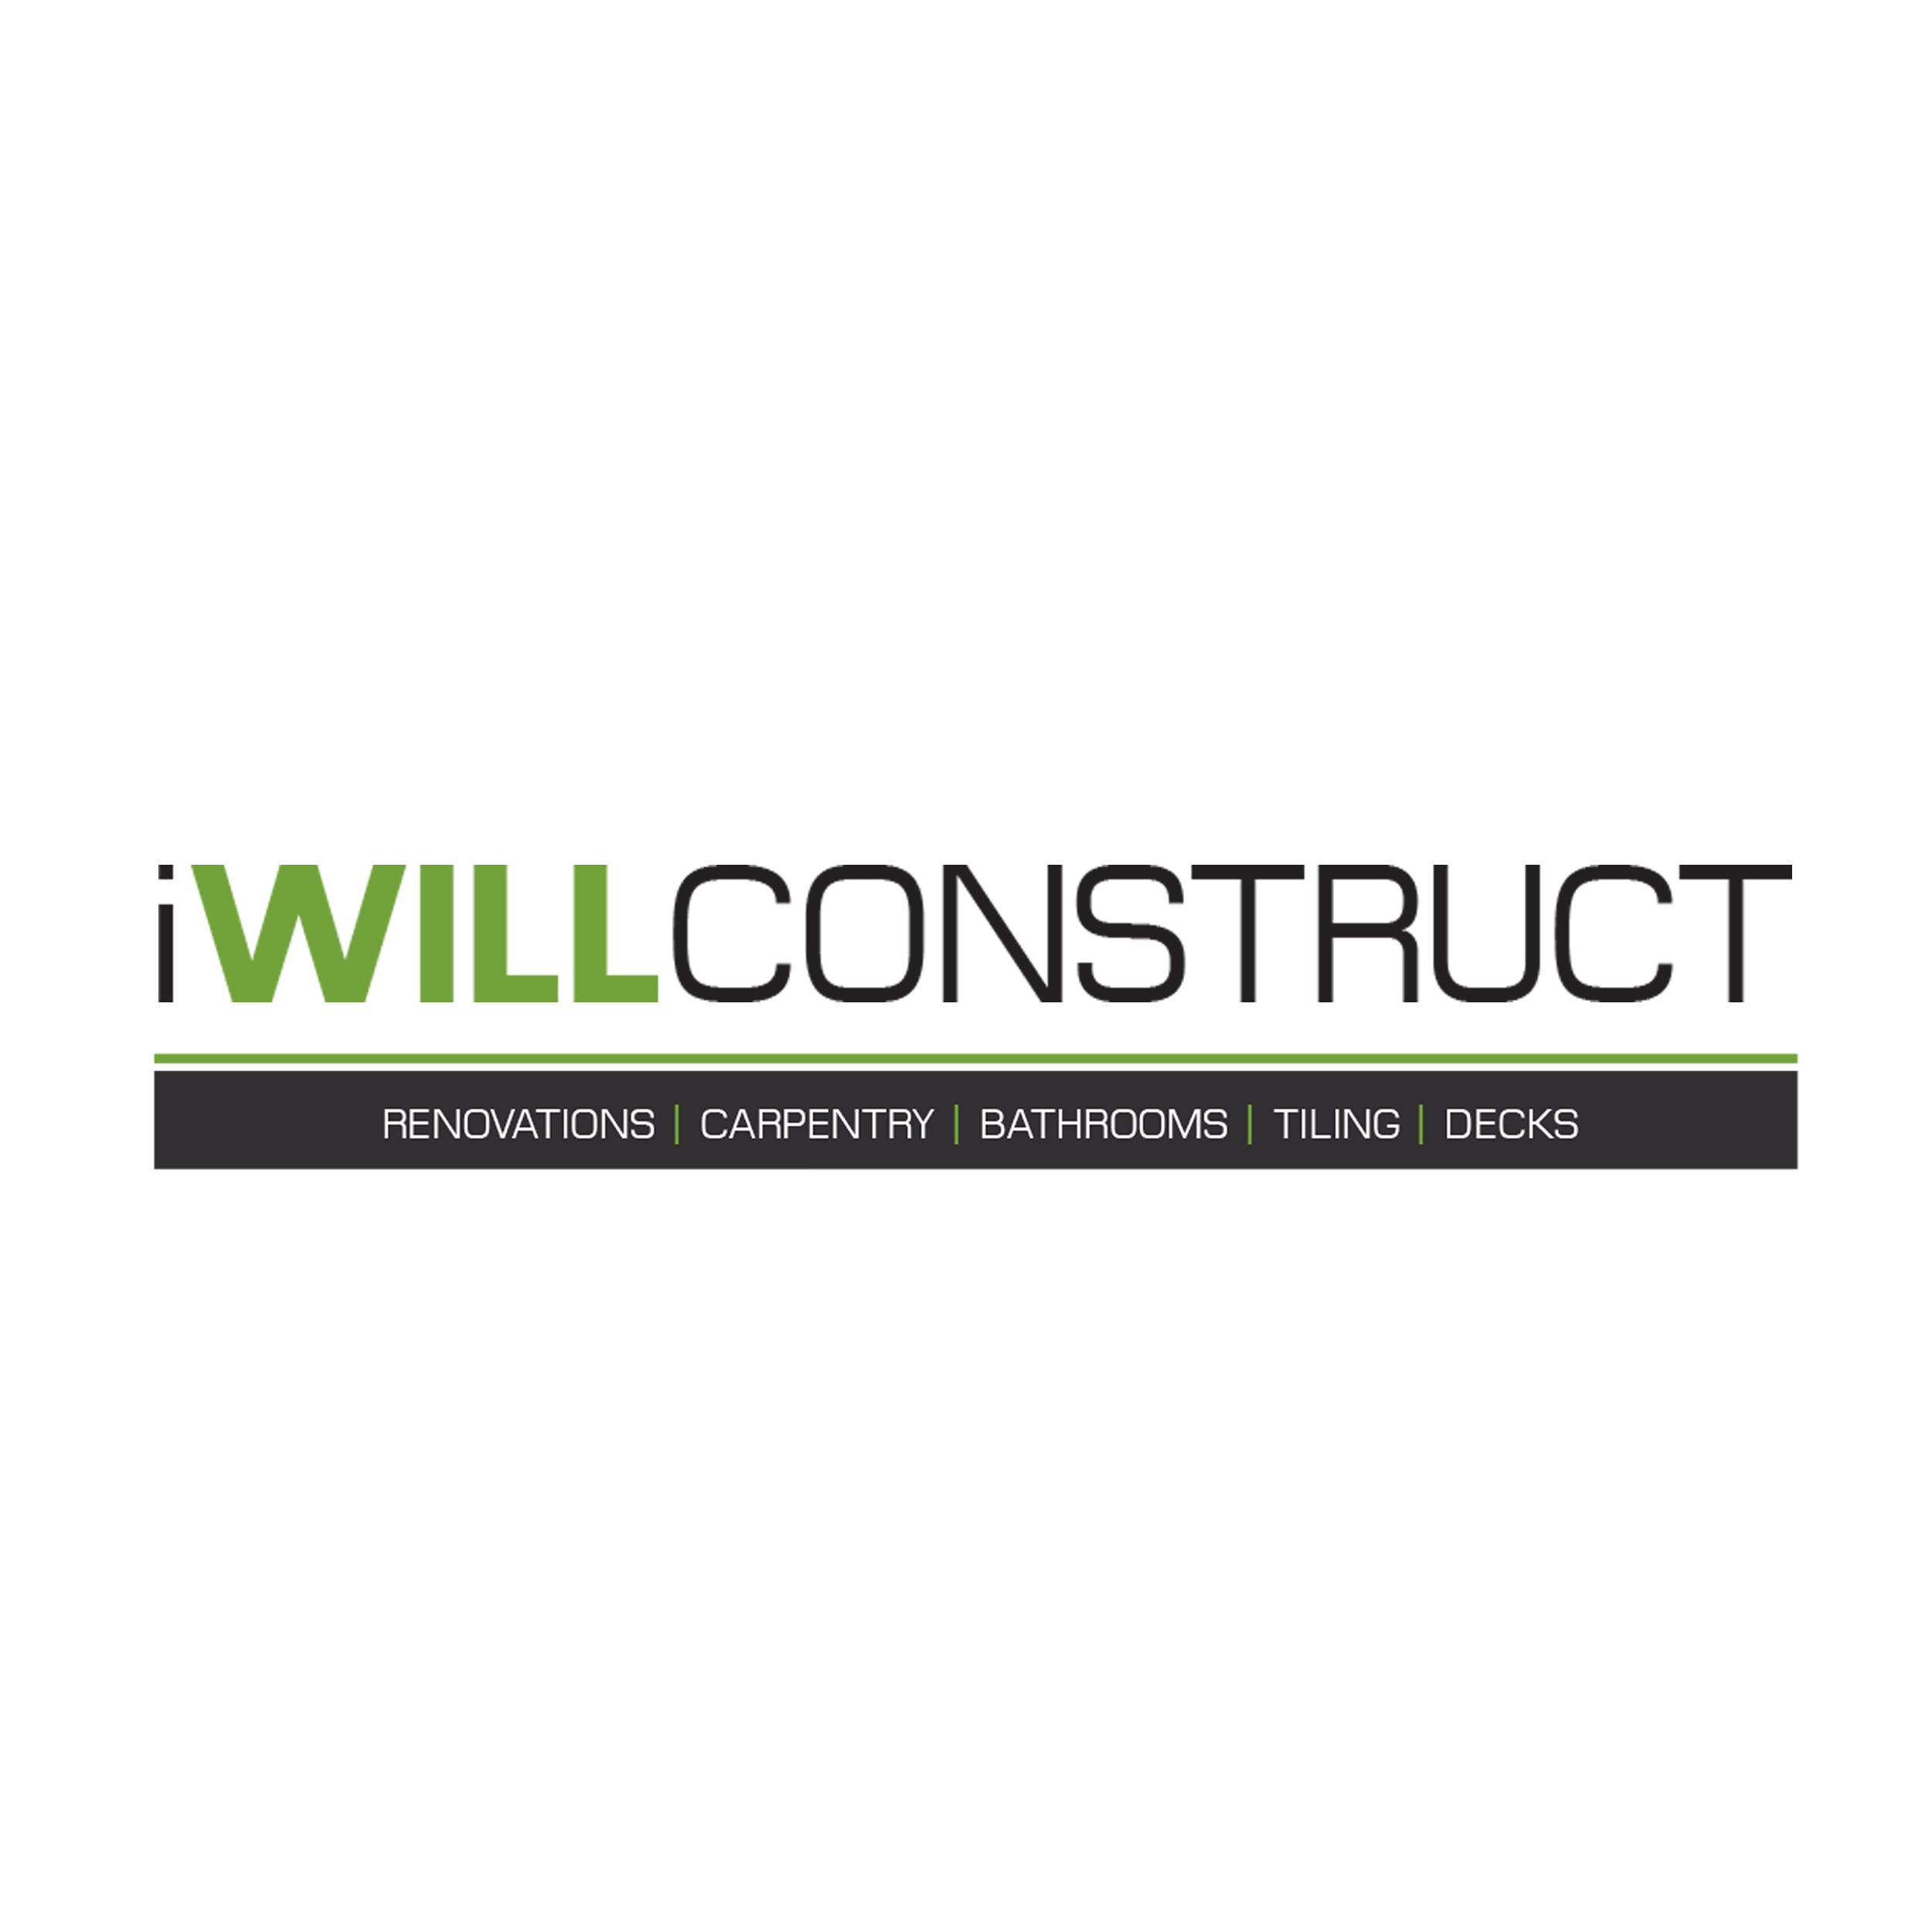 iWILLCONSTRUCT